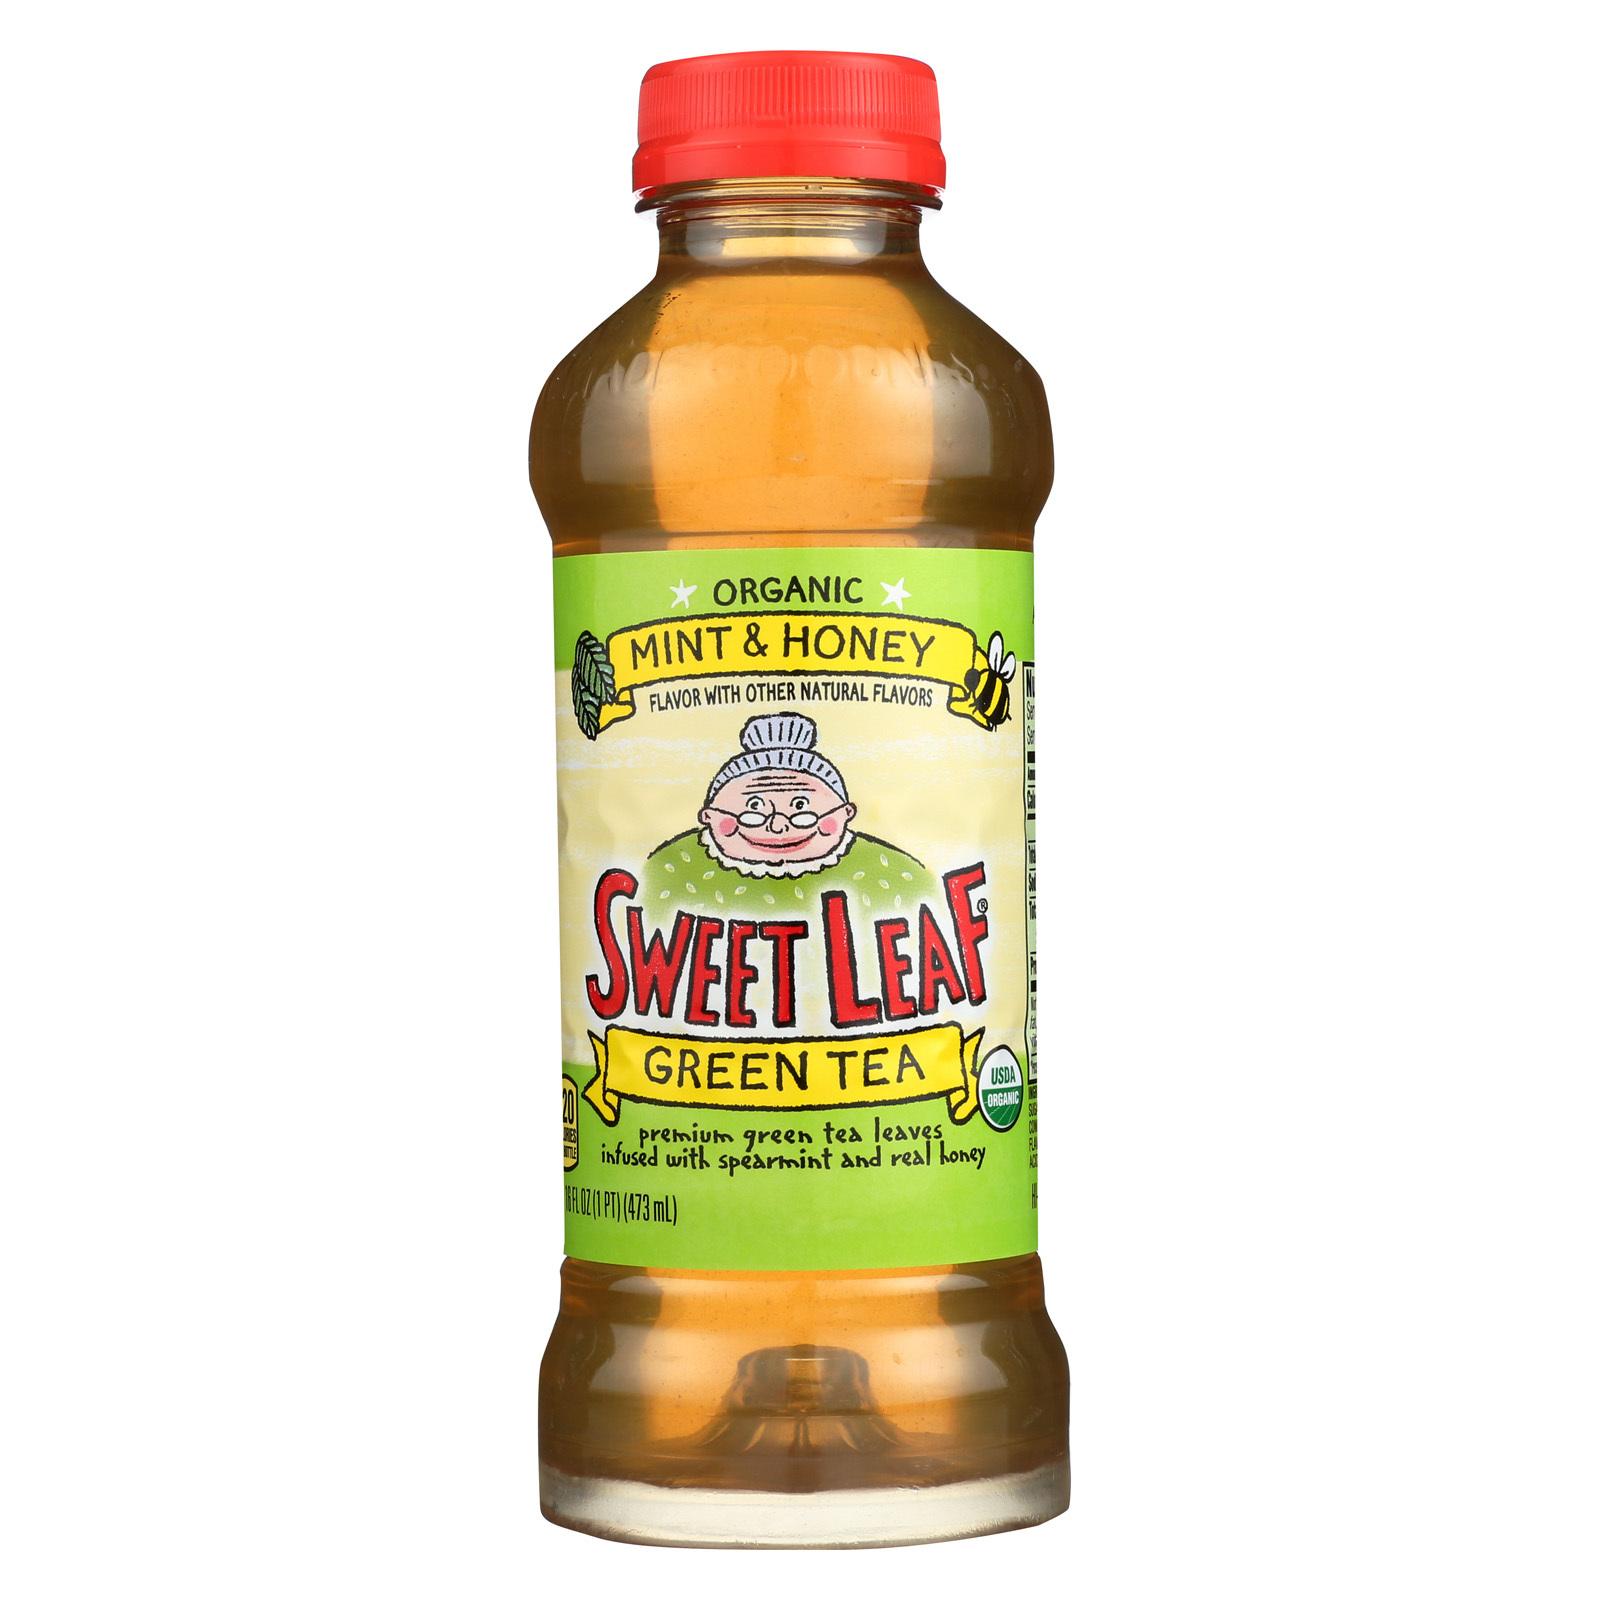 Sweet Leaf Tea Iced Green Tea - Mint and Honey - Case of 12 - 16 Fl oz.